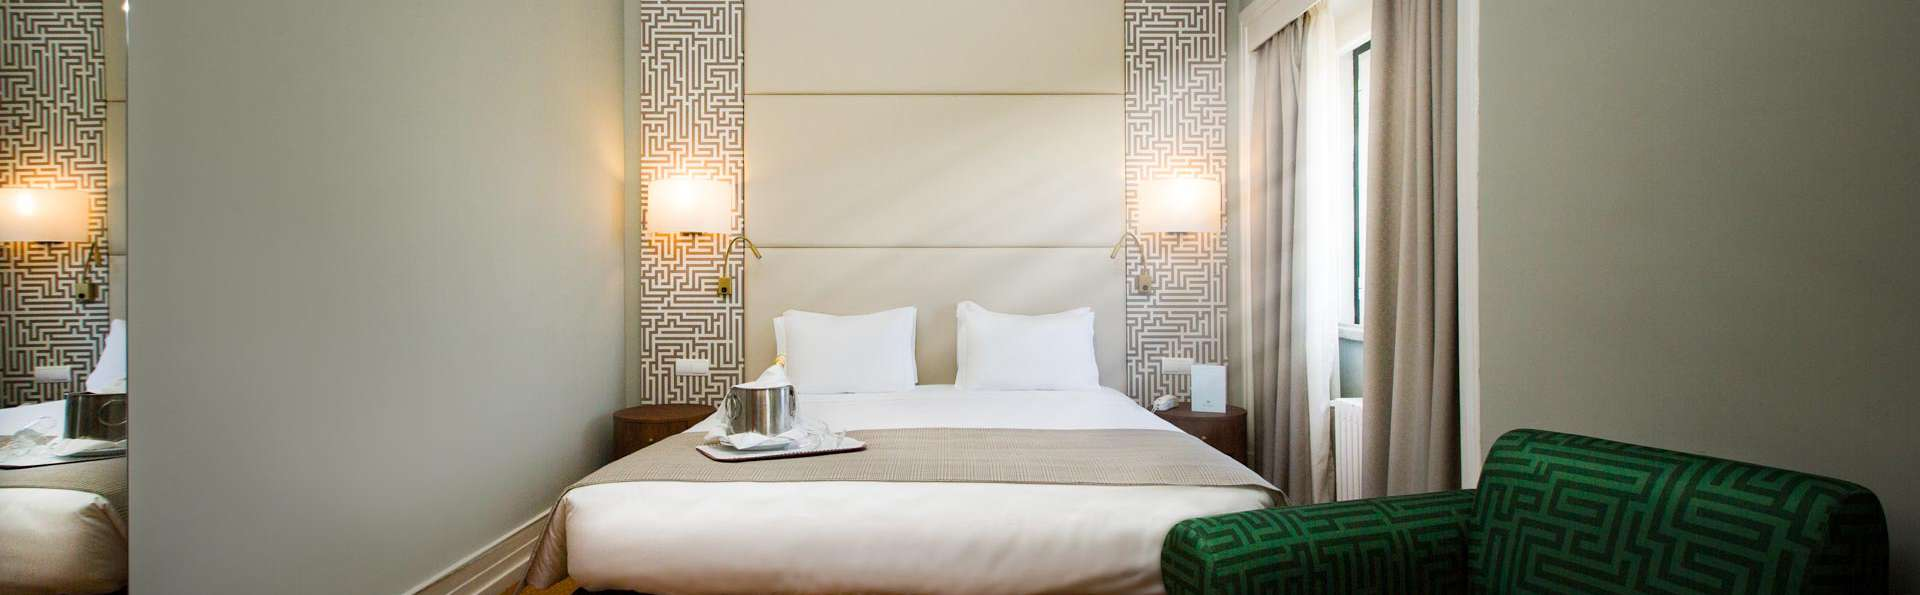 Hotel Miraparque - EDIT_ROOM_03.jpg